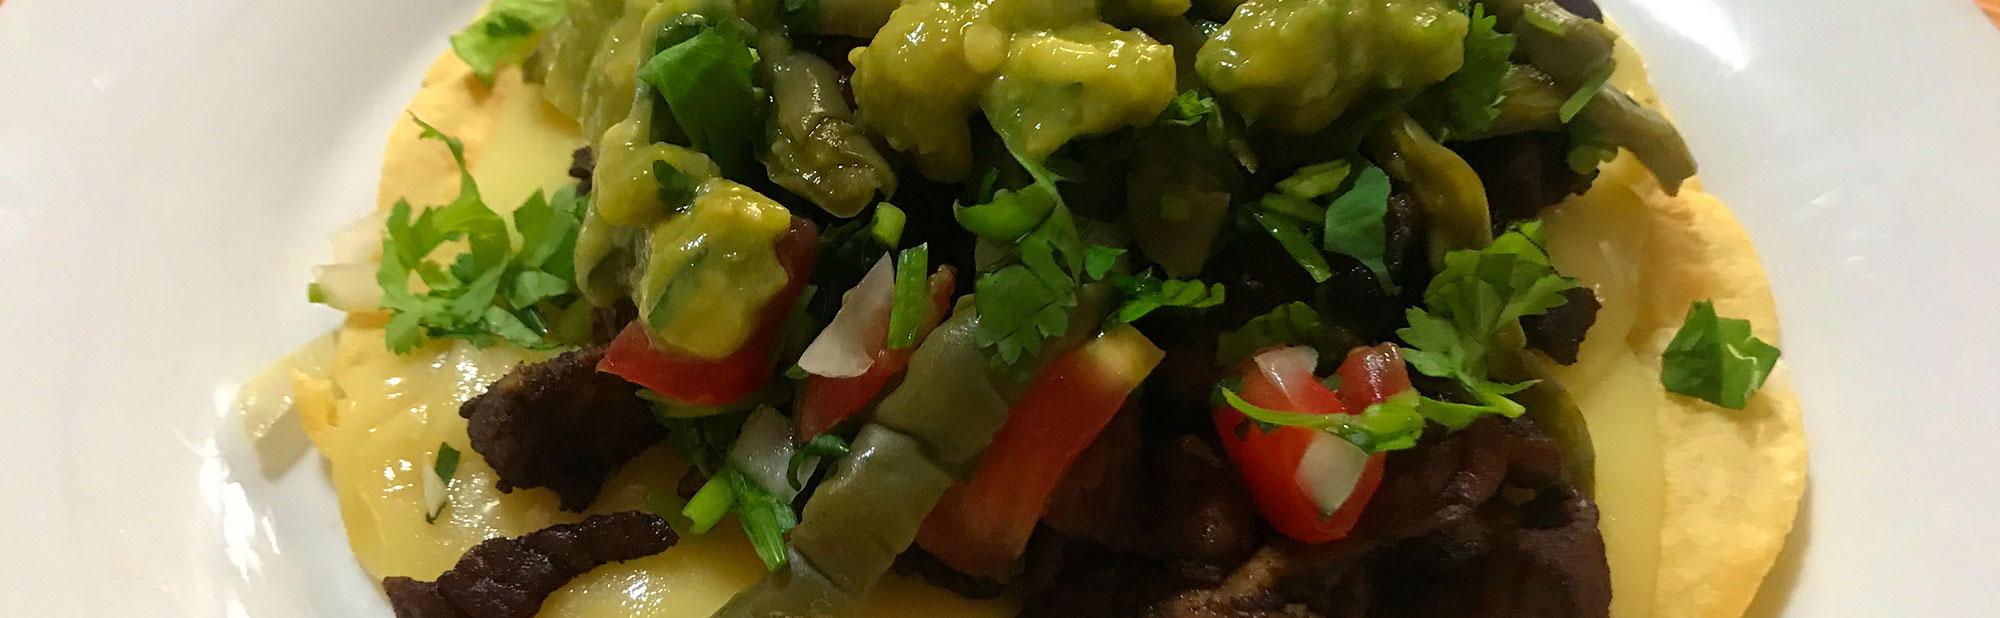 La Antojadera | Beef Steak Volcano with Flour Tortilla